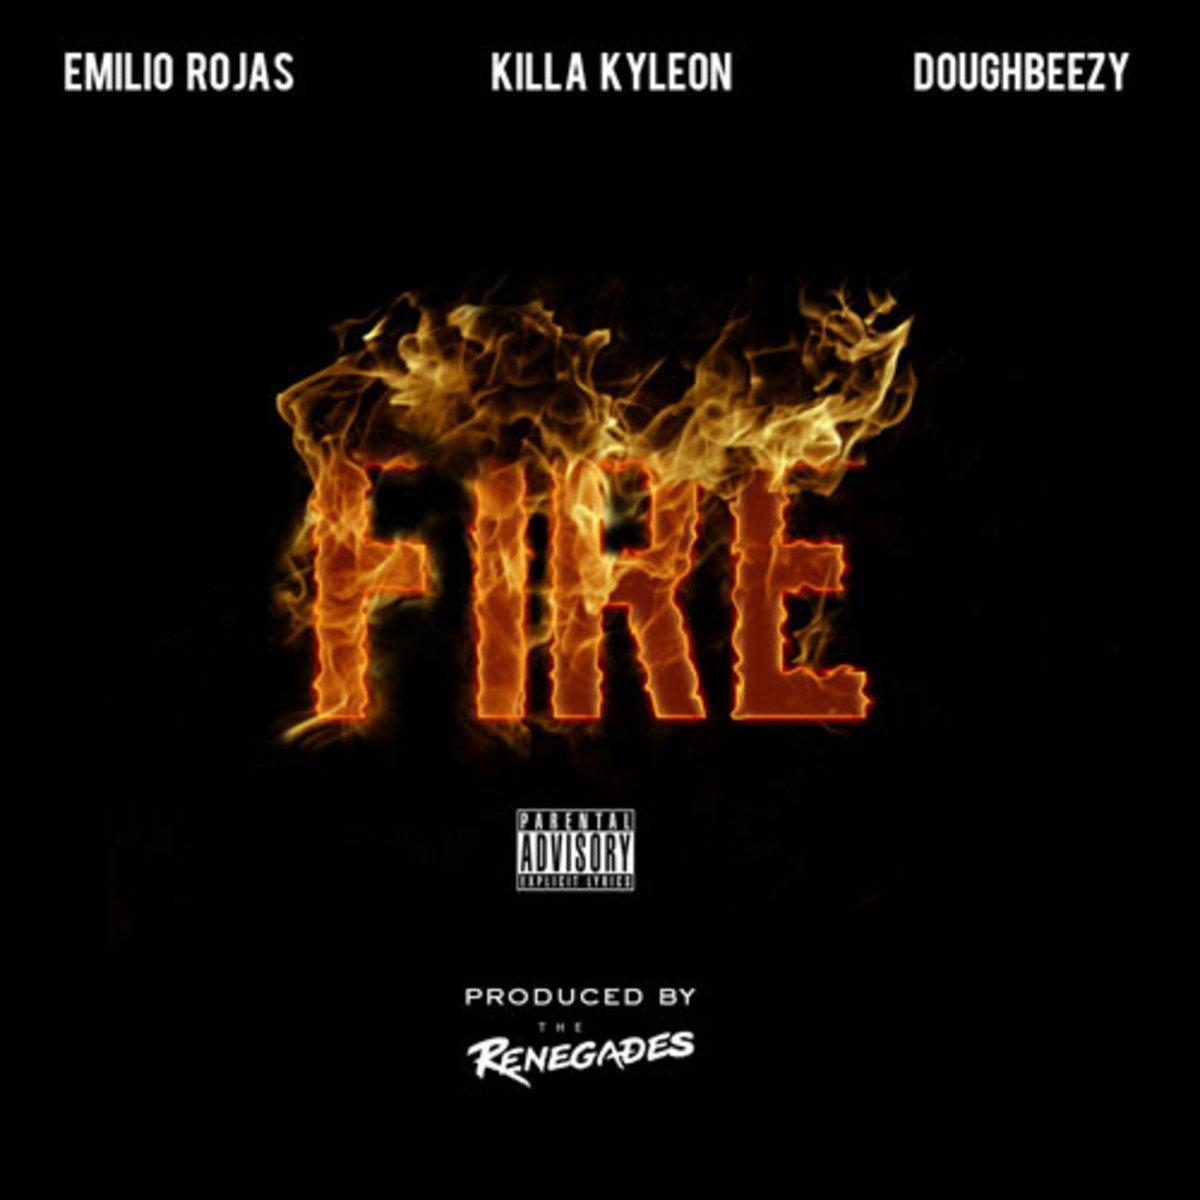 emiliorojas-fire.jpg